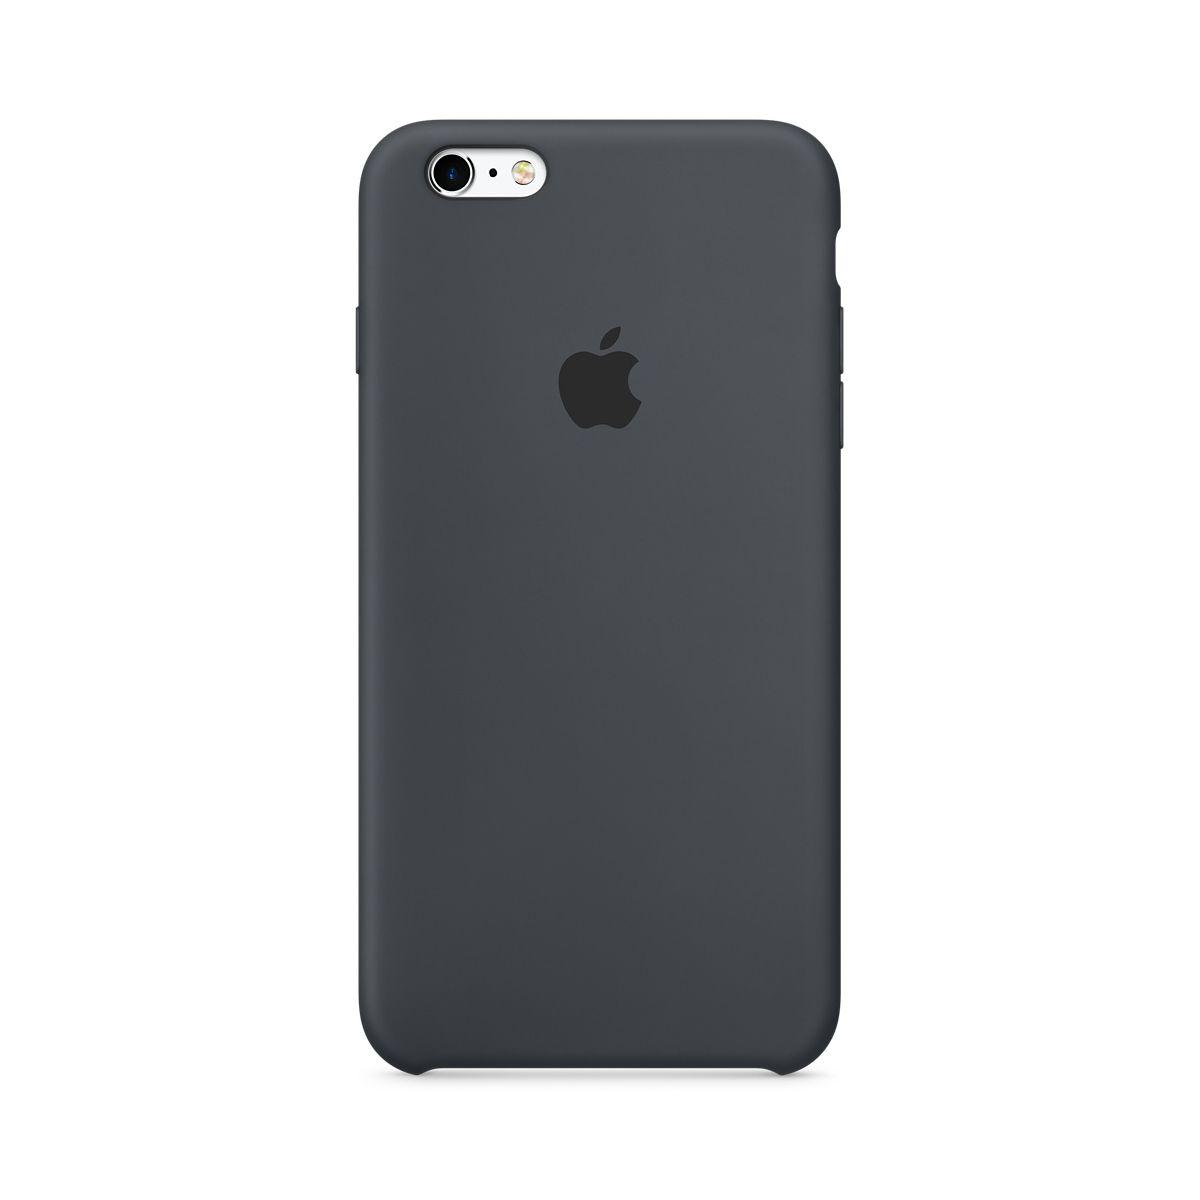 Coque APPLE iPhone 6s Gris Anthracite (photo)